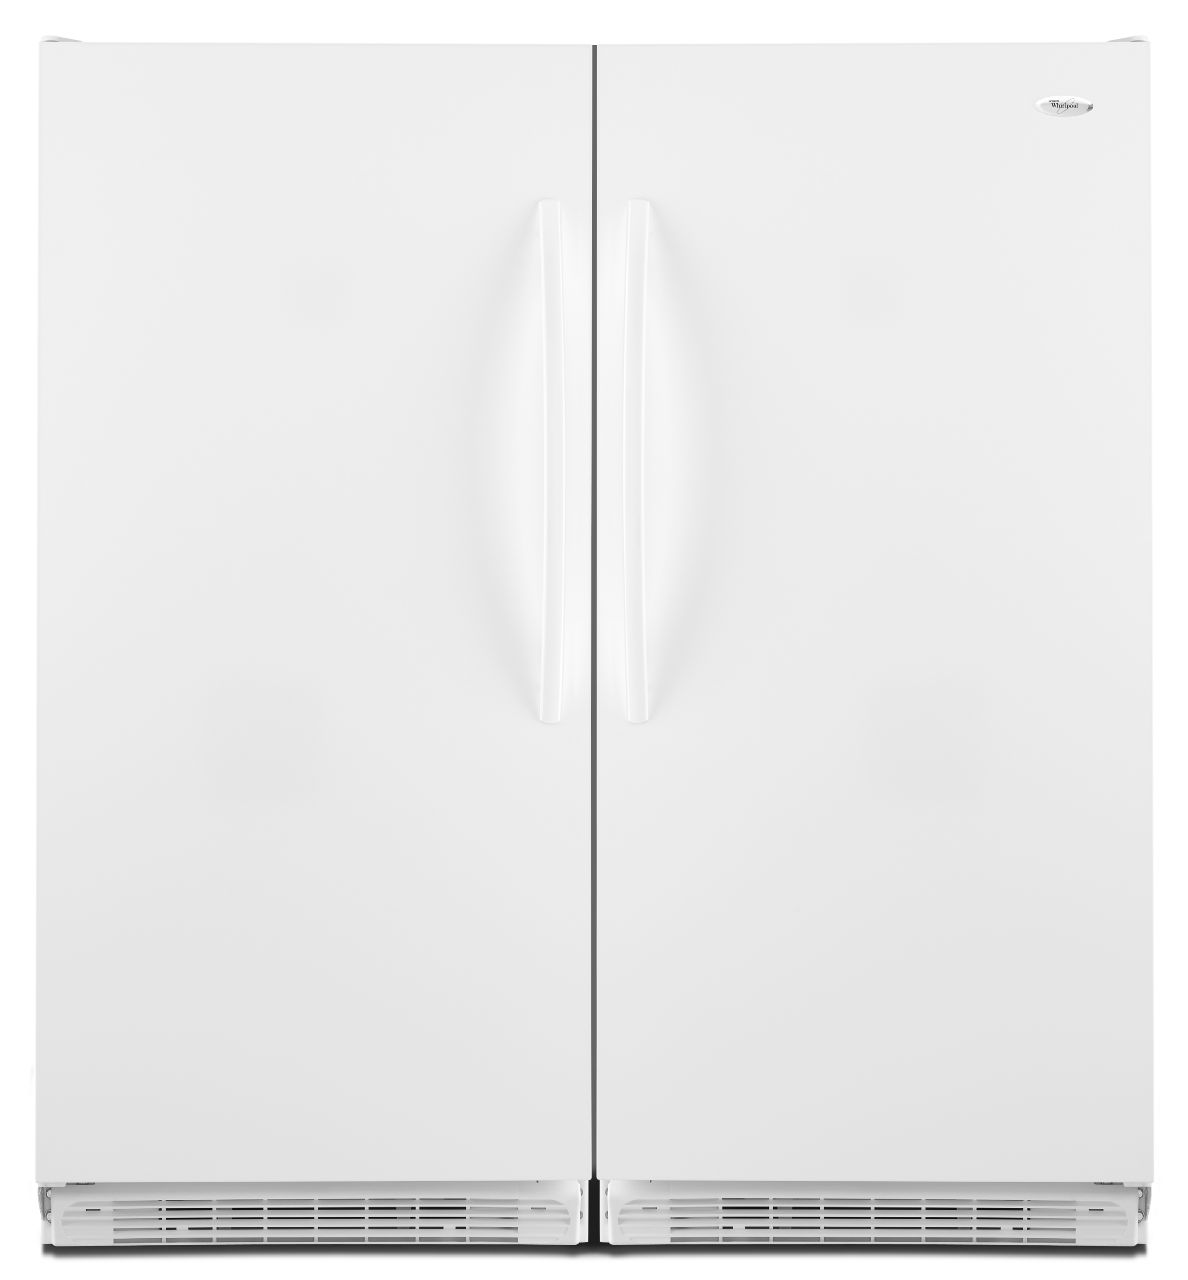 Whirlpool Refrigerator Model EL88TRRWQ01 Parts